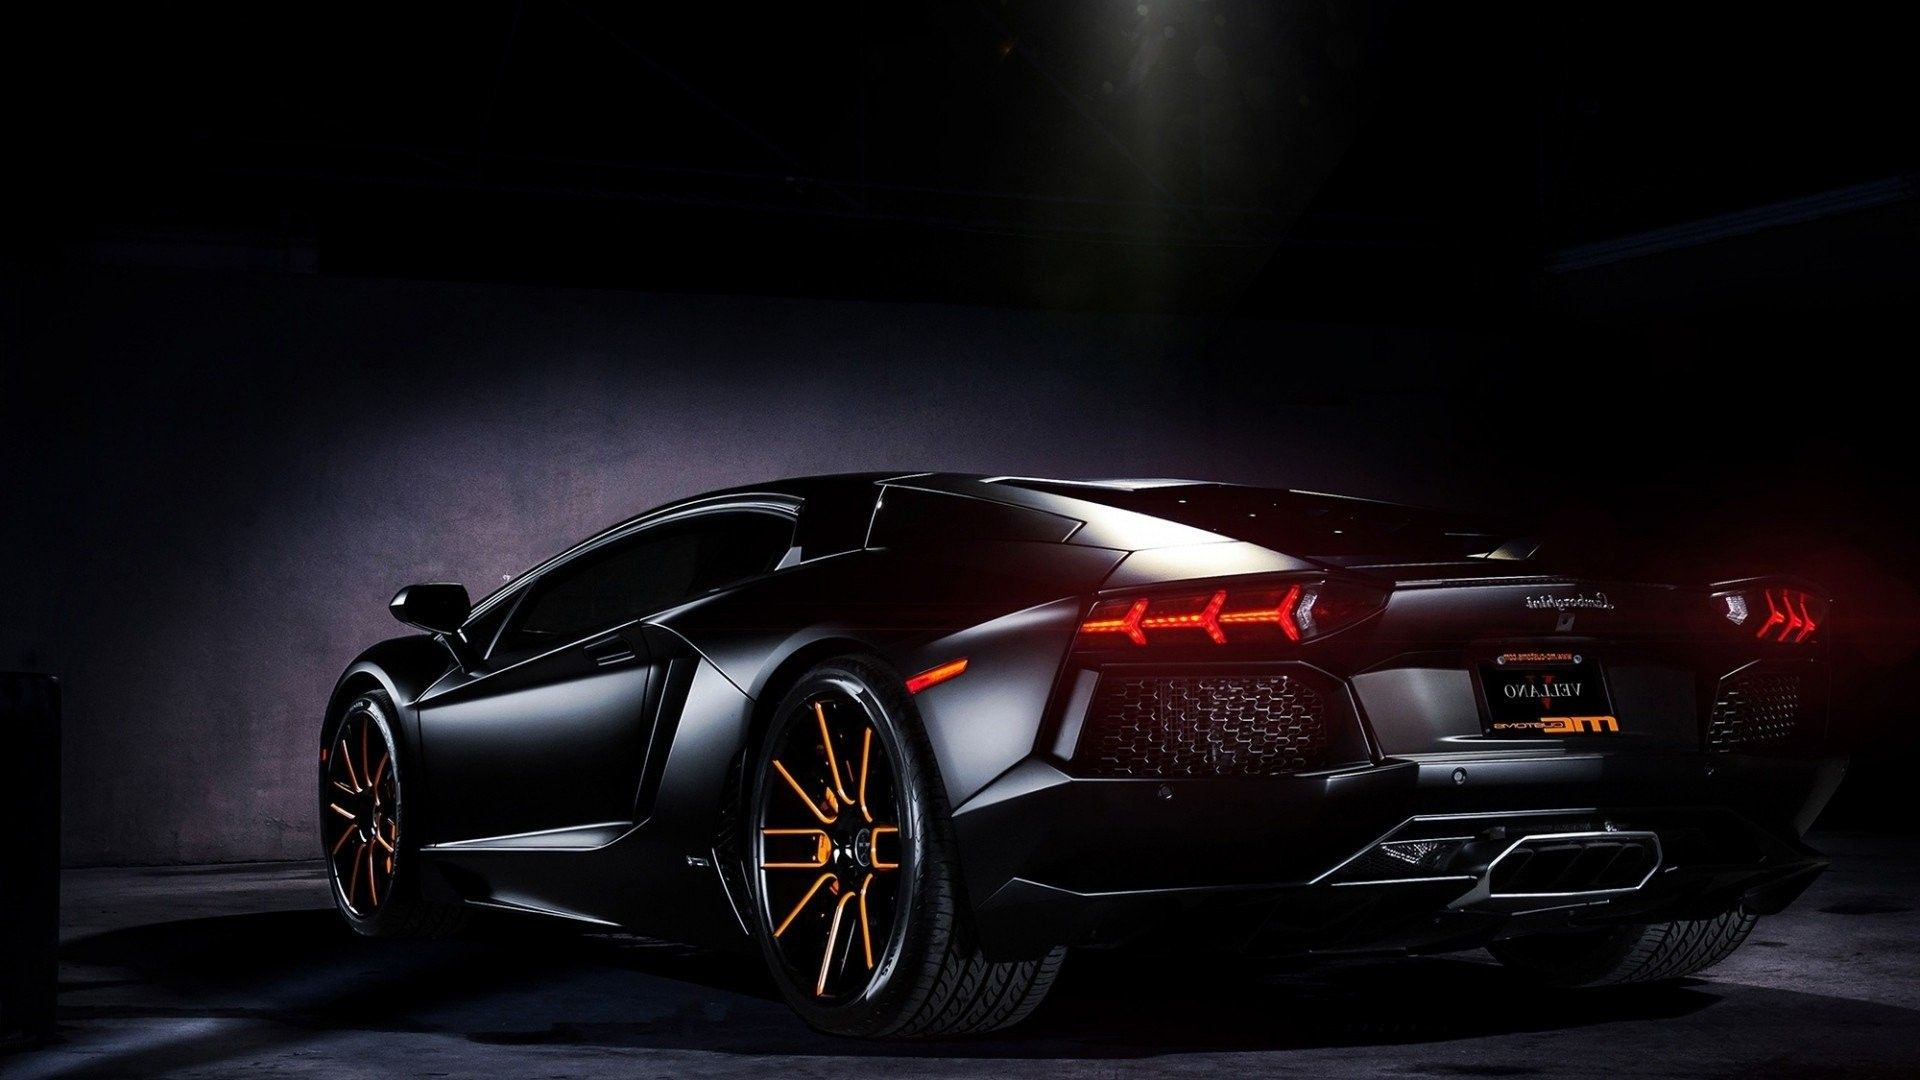 Lamborghini Laptop Wallpapers Top Free Lamborghini Laptop Backgrounds Wallpaperaccess